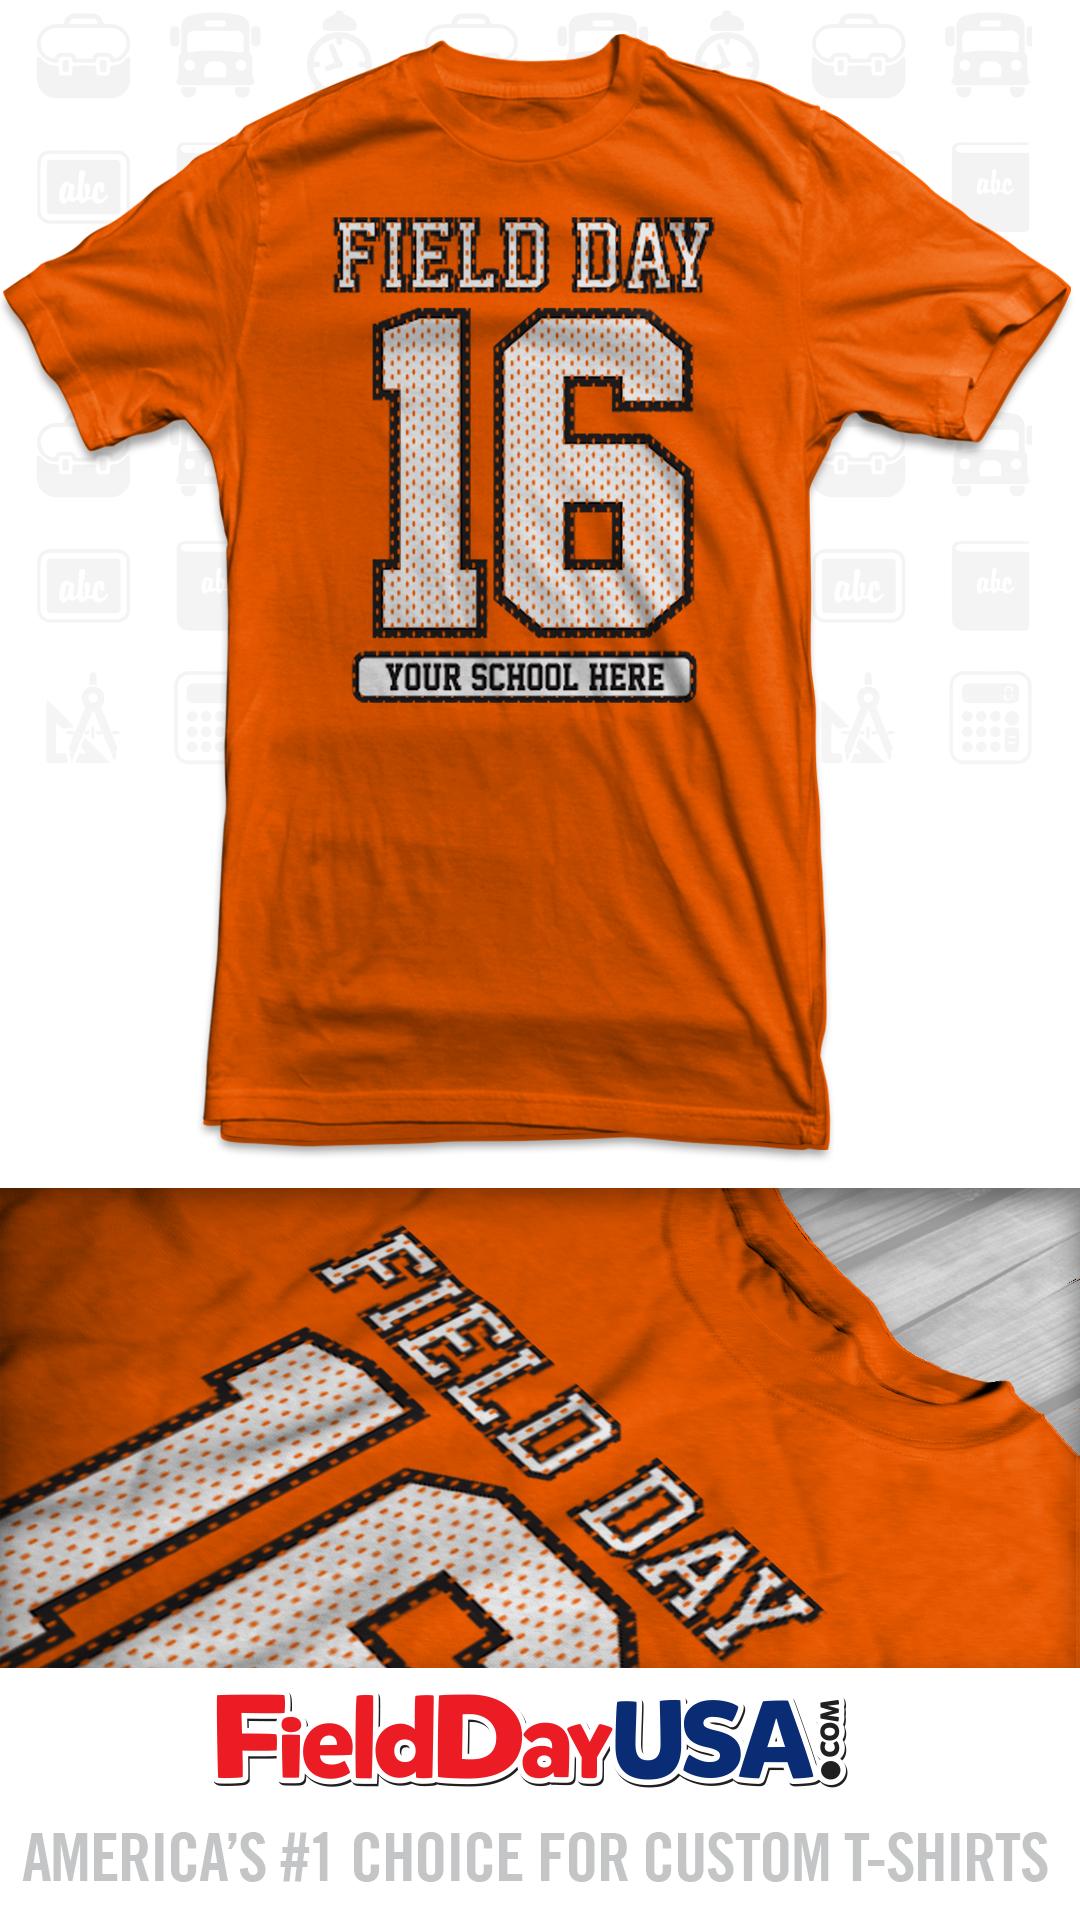 Shirt design pinterest - Top Selling Field Day T Shirt Ts16 02